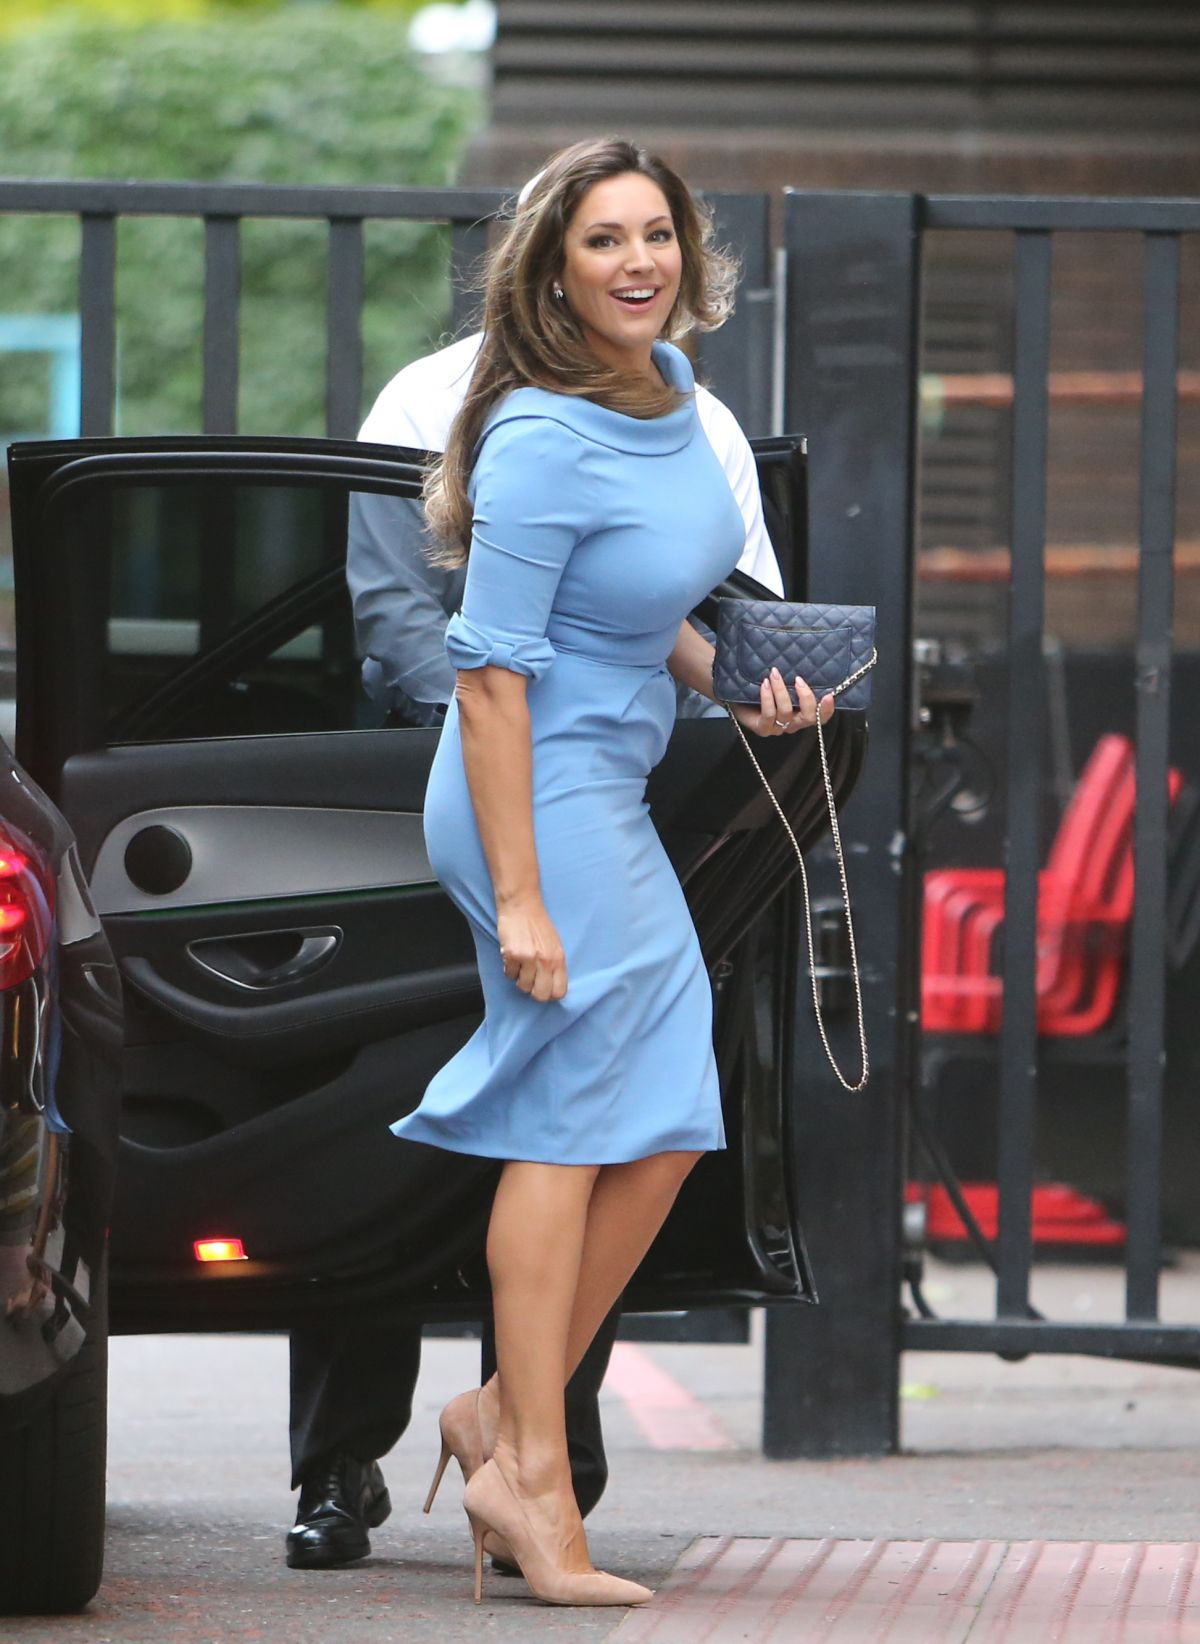 9d0f41ed43 KELLY BROOK Arrives at ITV Studios in London 08 11 2016